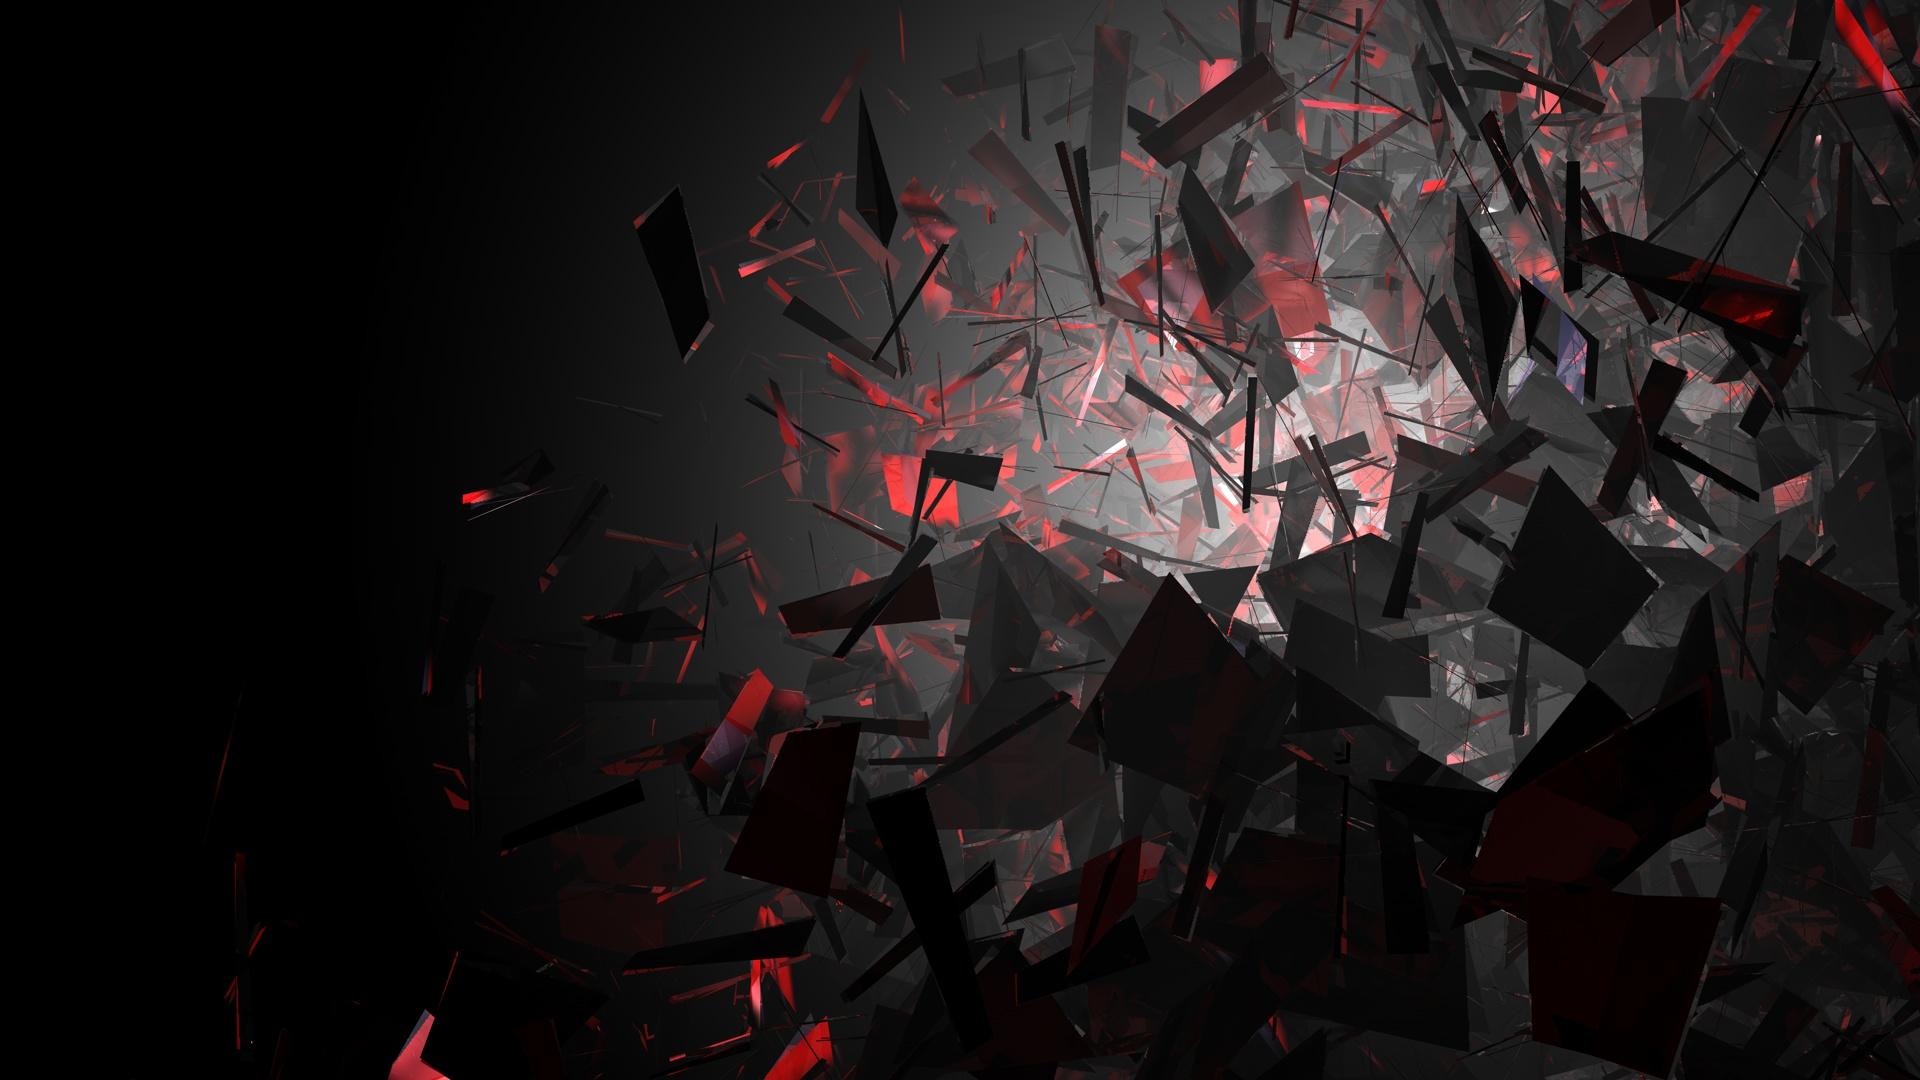 Abstract Dark Wallpaper 1920x1080 Abstract Dark 1920x1080